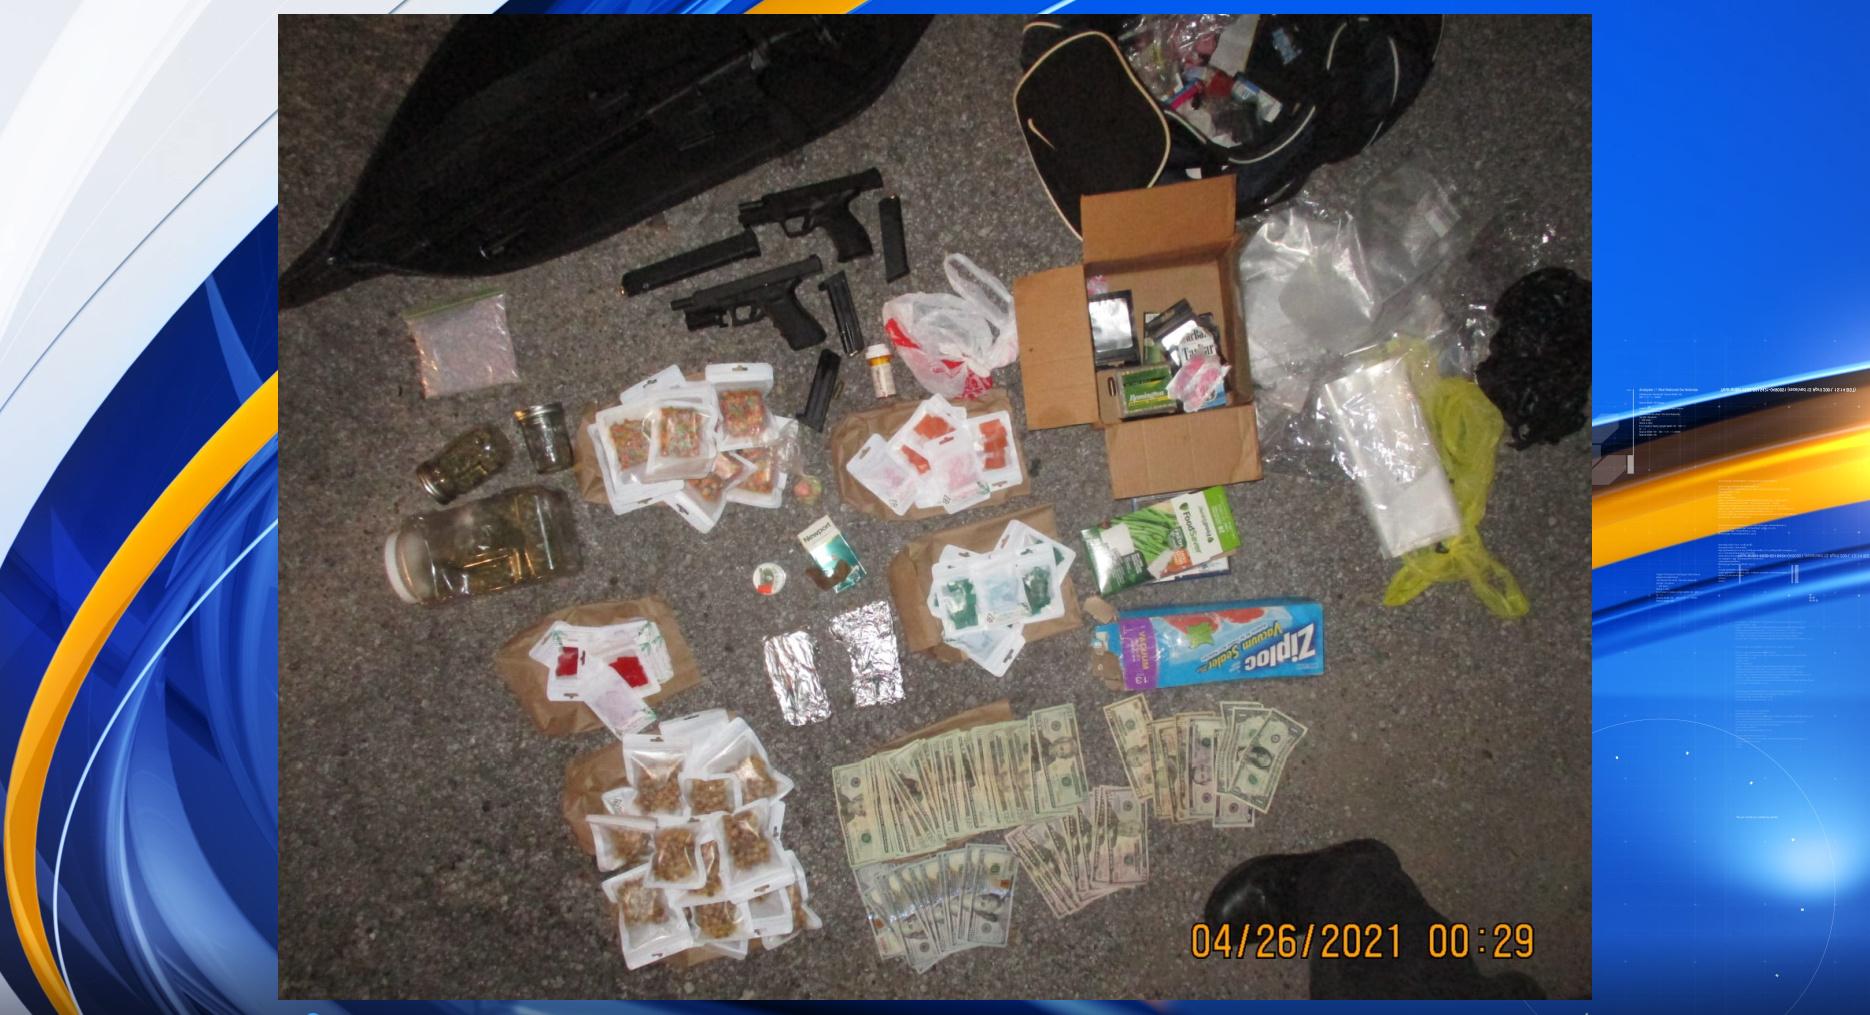 4/25 Tuscaloosa drug bust